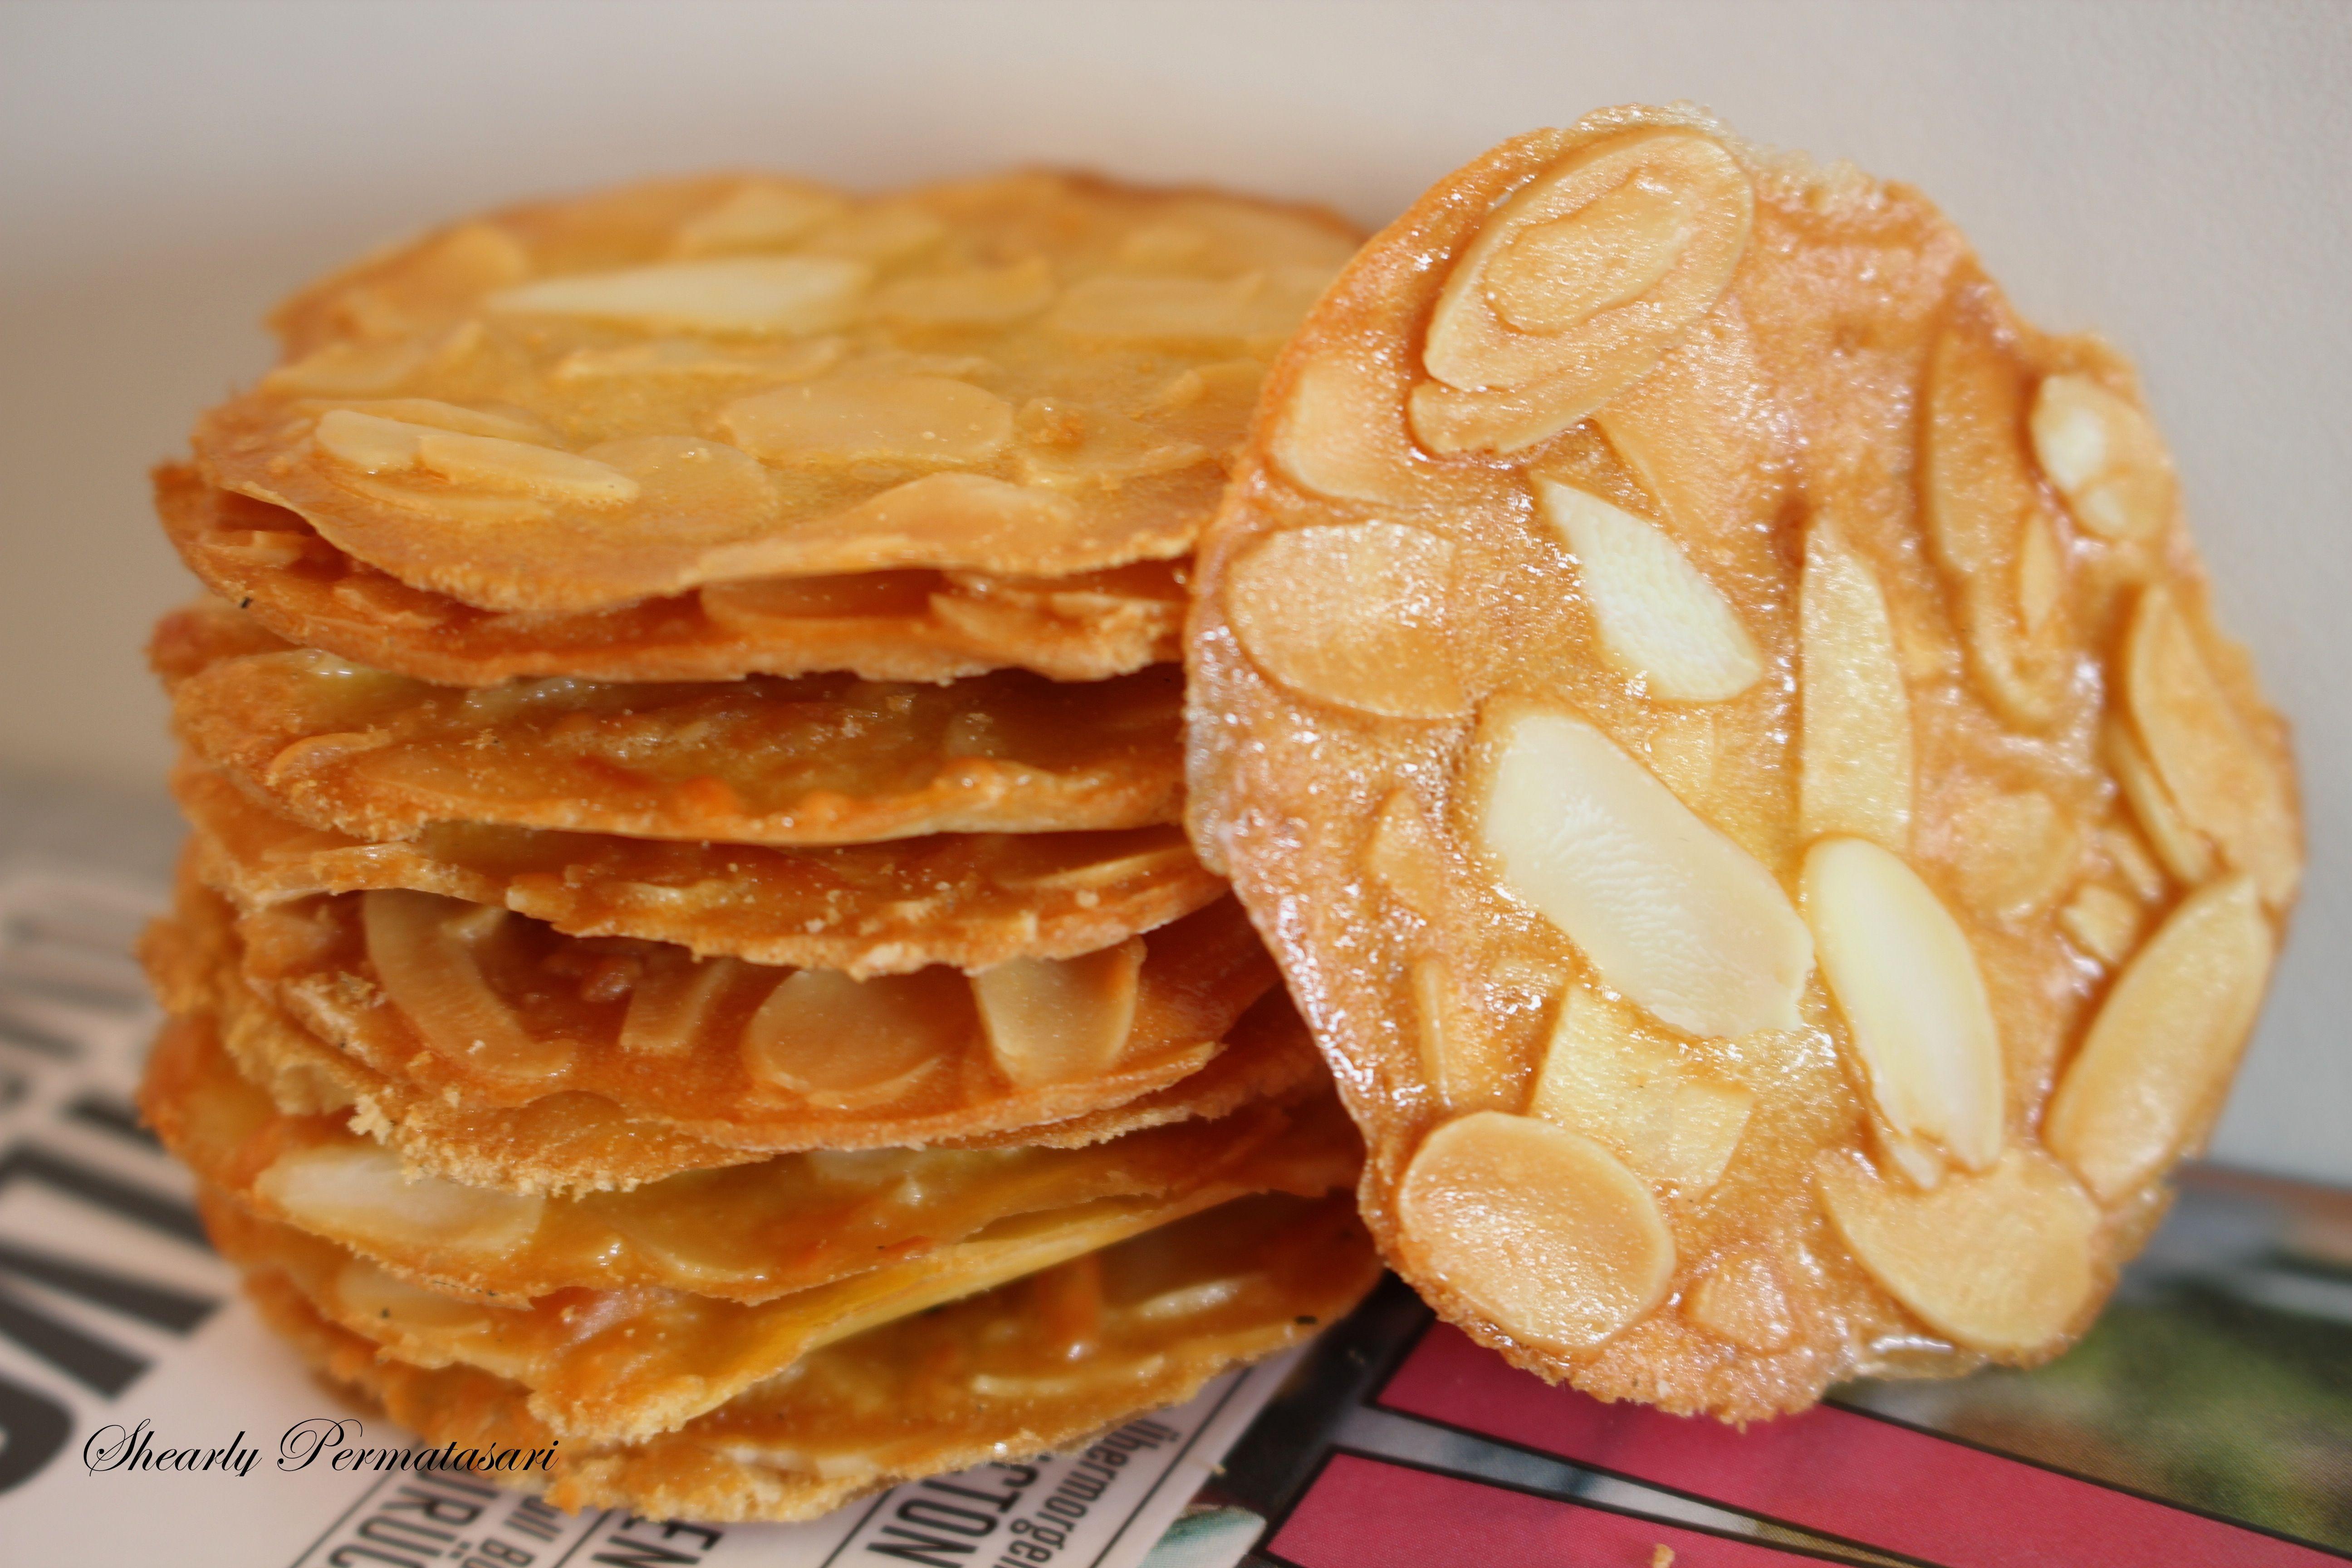 Almond Crispy Cookies Bilingual Eng Indonesia Resep Biskuit Kue Kering Mentega Makanan